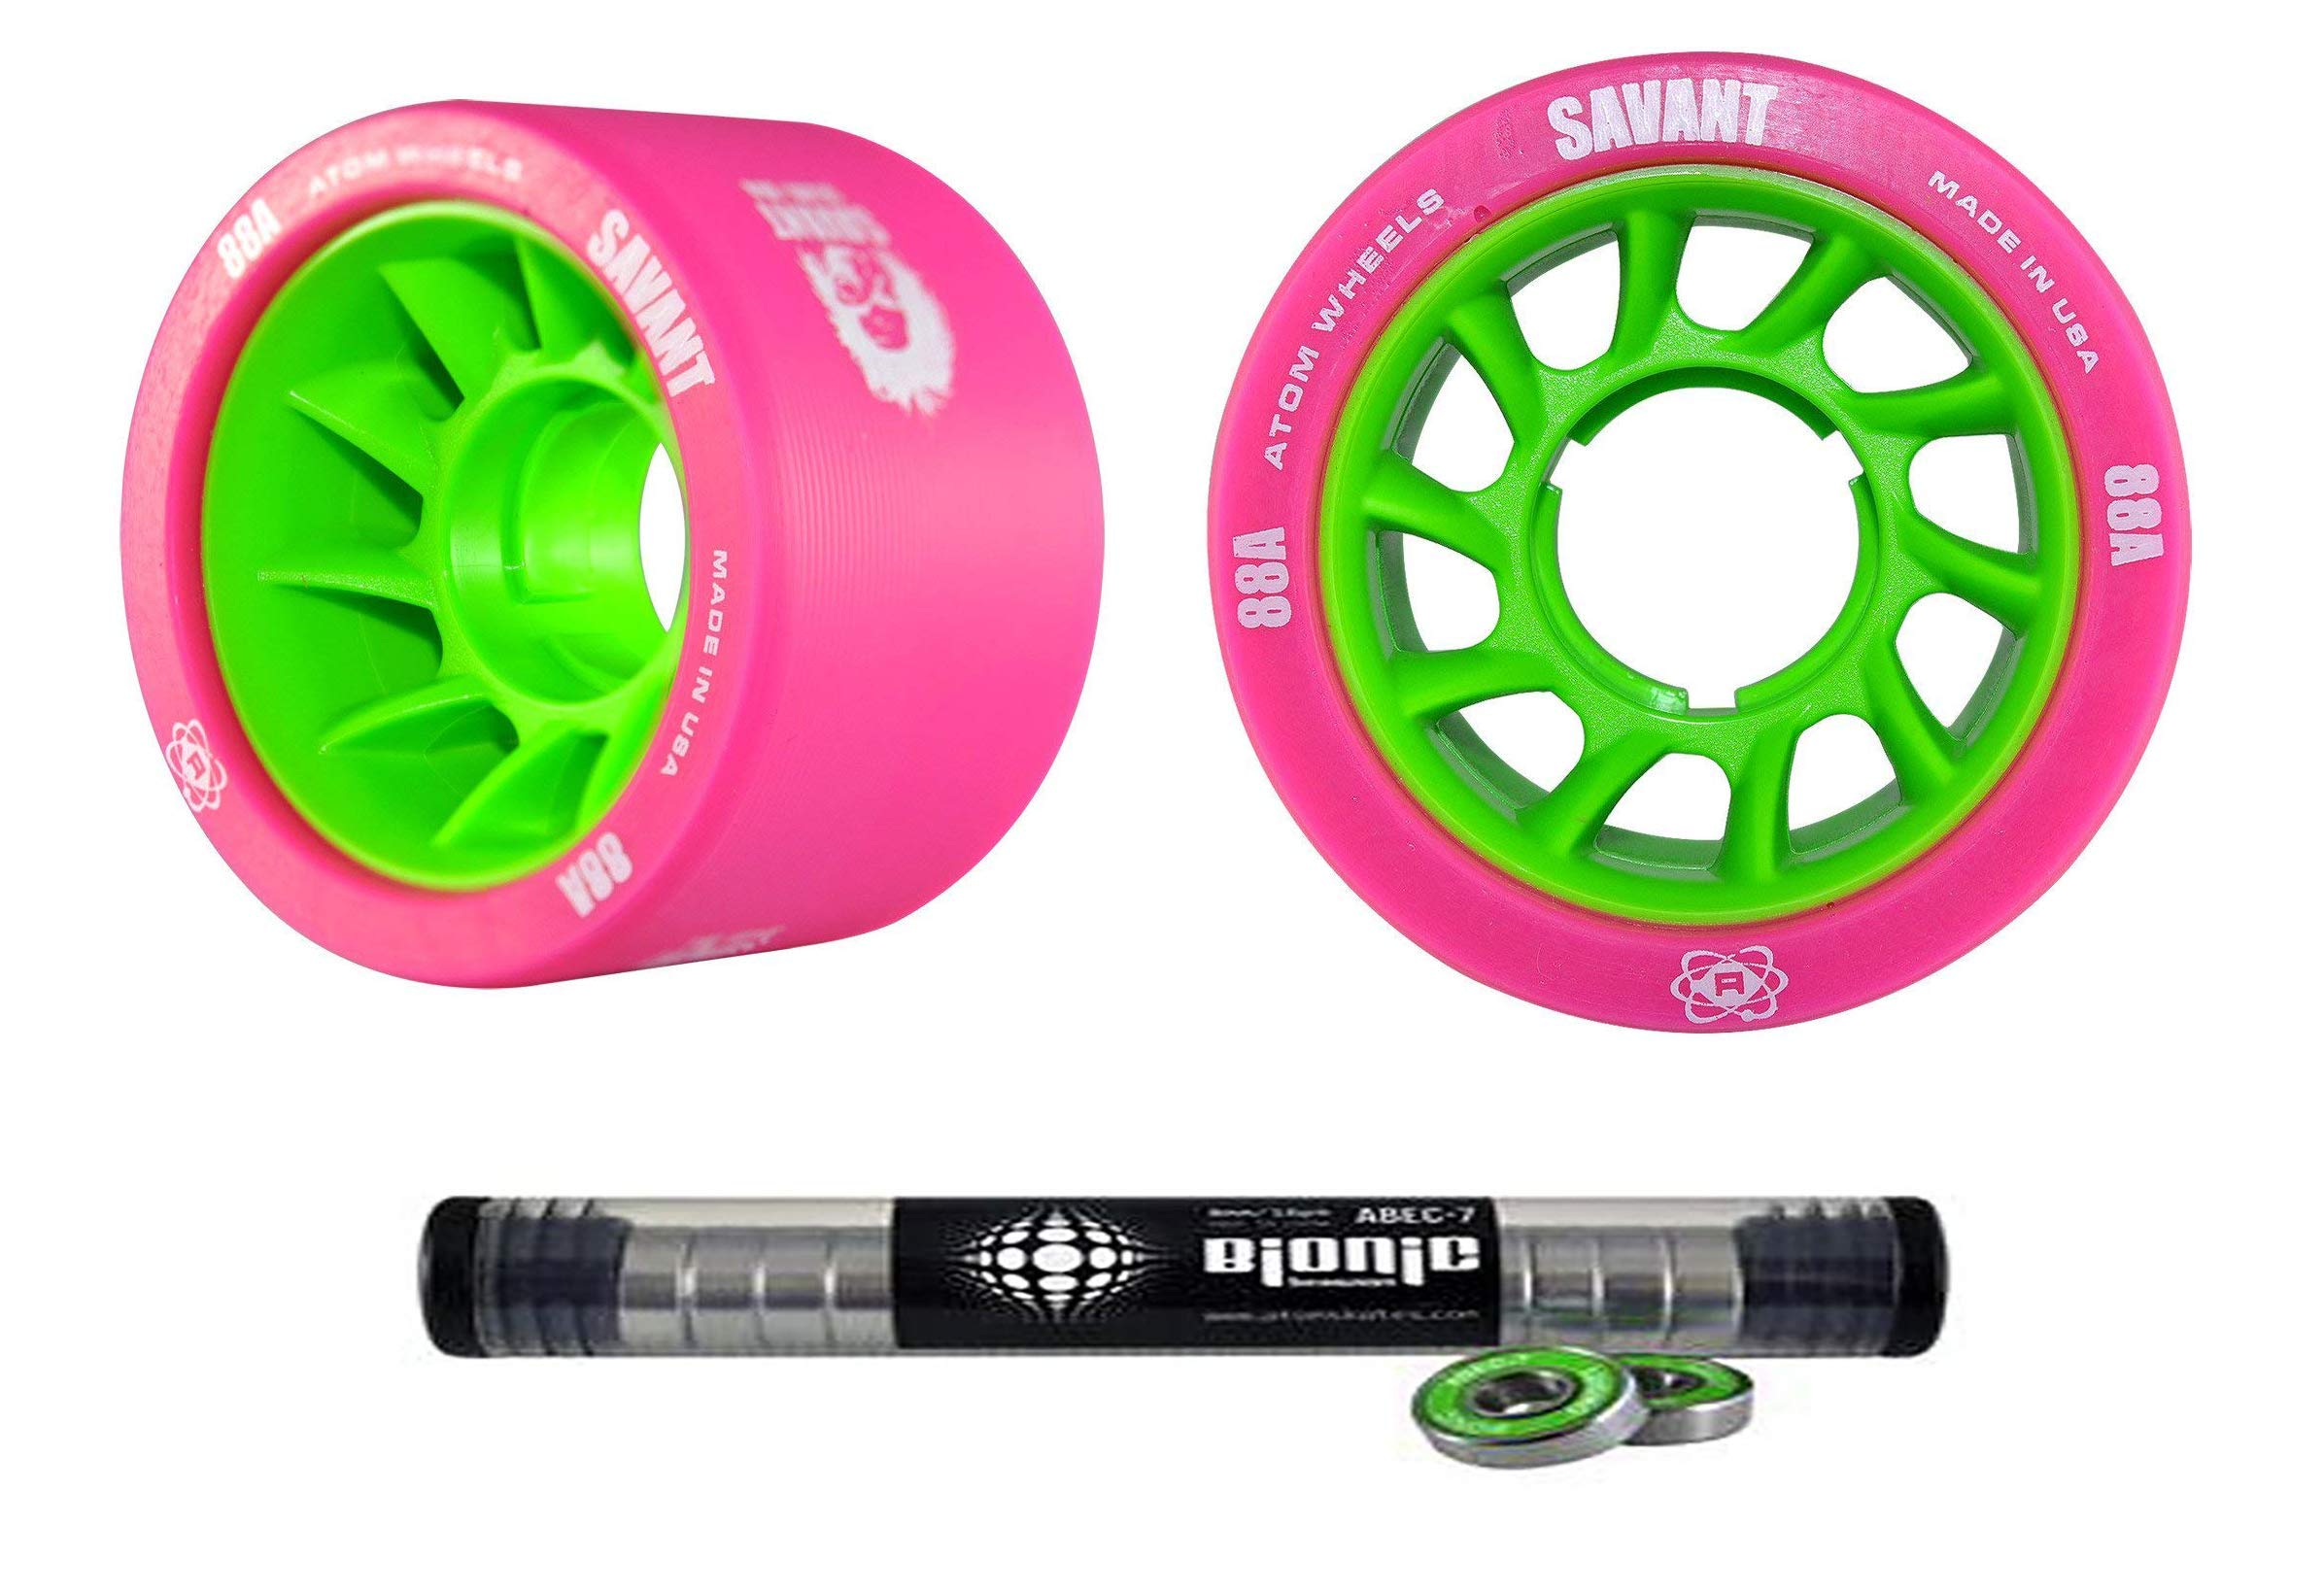 Atom Savant Skate Wheels with Bionic Bearings 8mm Full Set of 8 - Pink 88A by Atom Skates